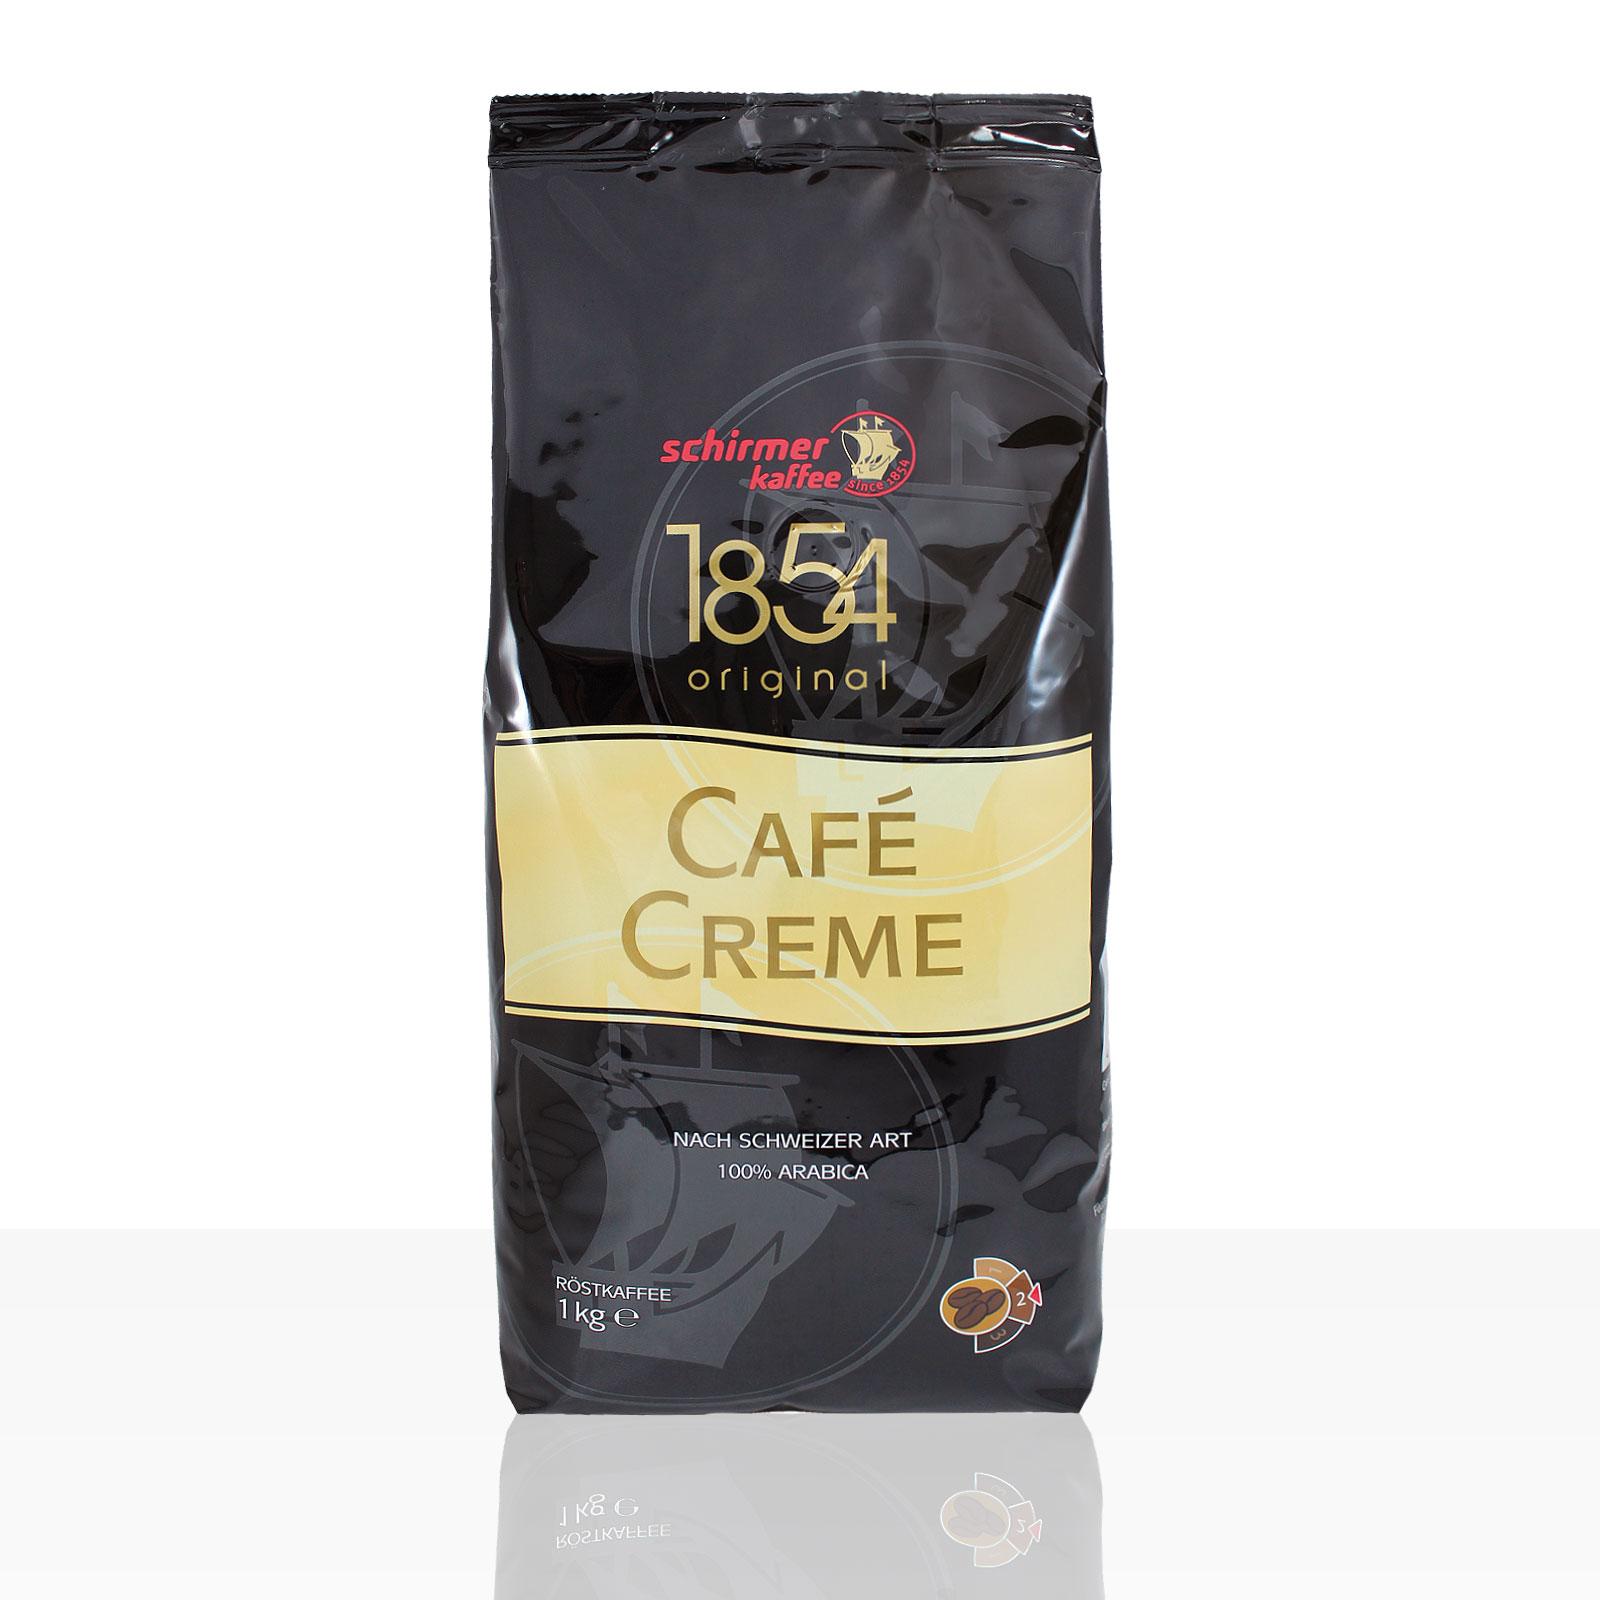 Schirmer Cafe Creme 1854 - 1kg ganze Kaffee-Bohne, 100% Arabica